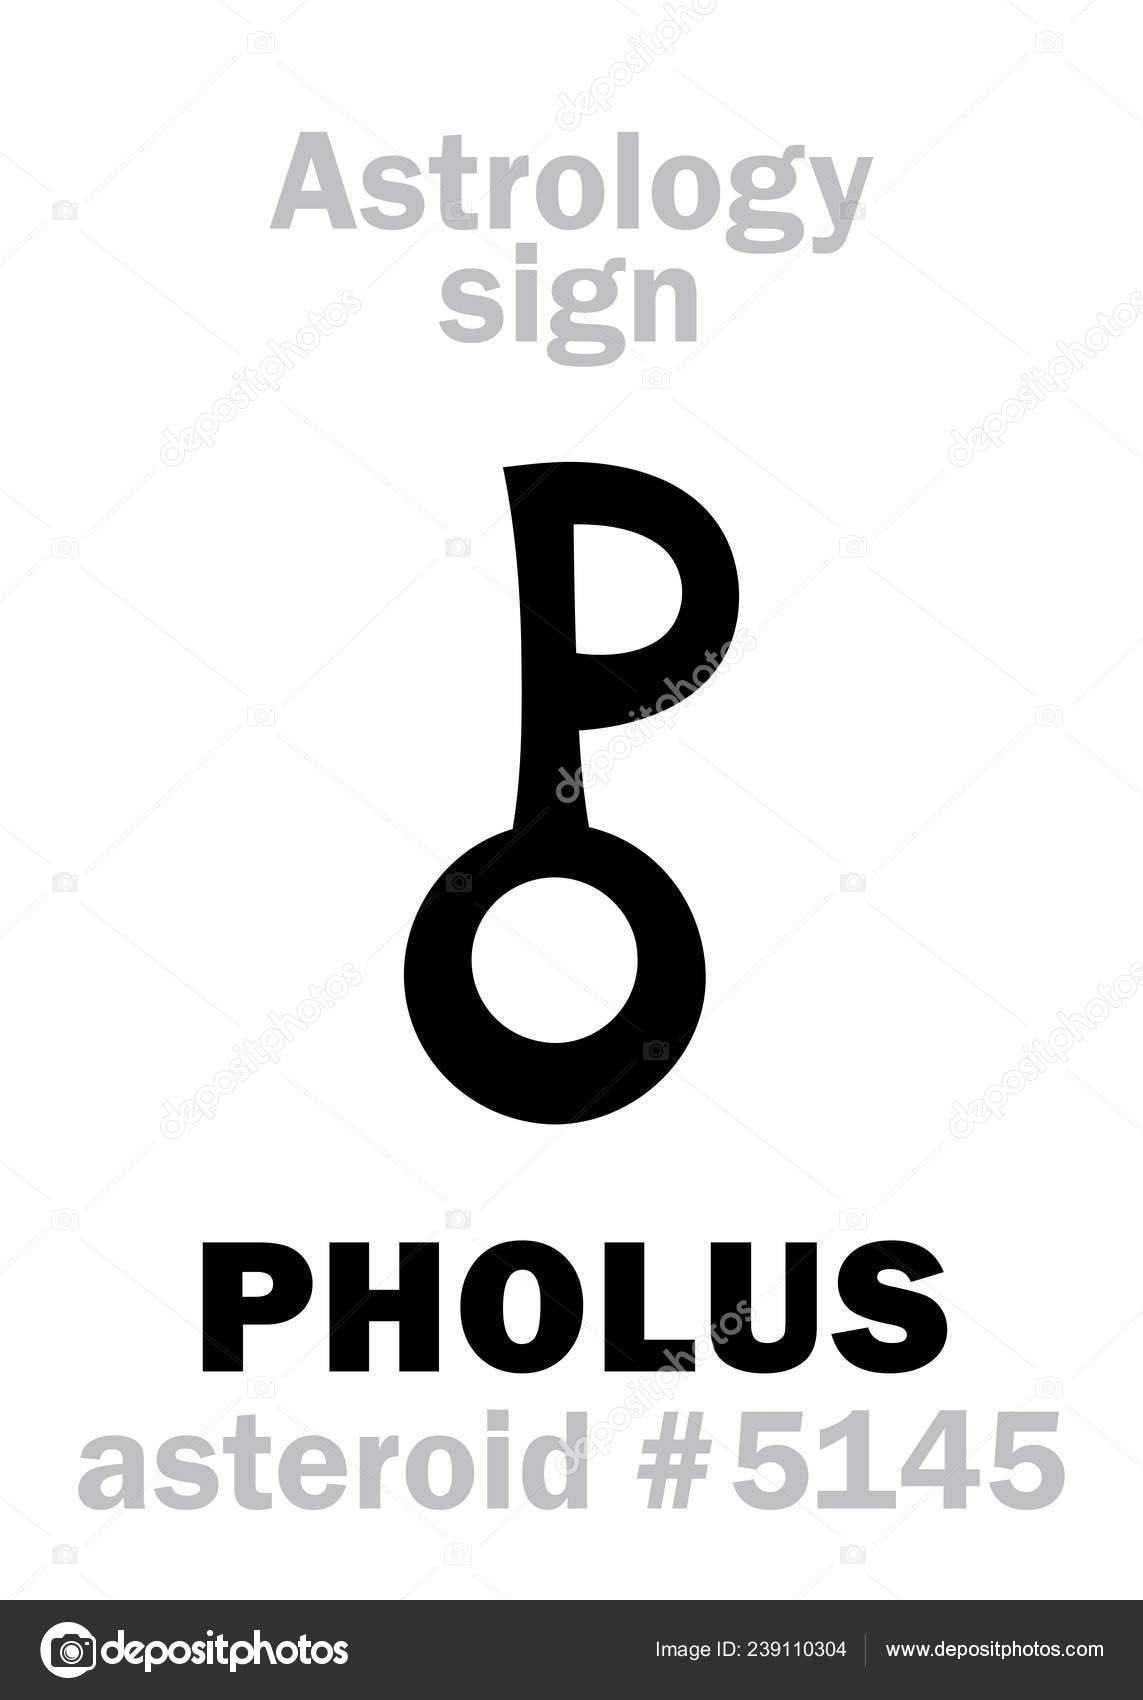 pholus centaur astrology